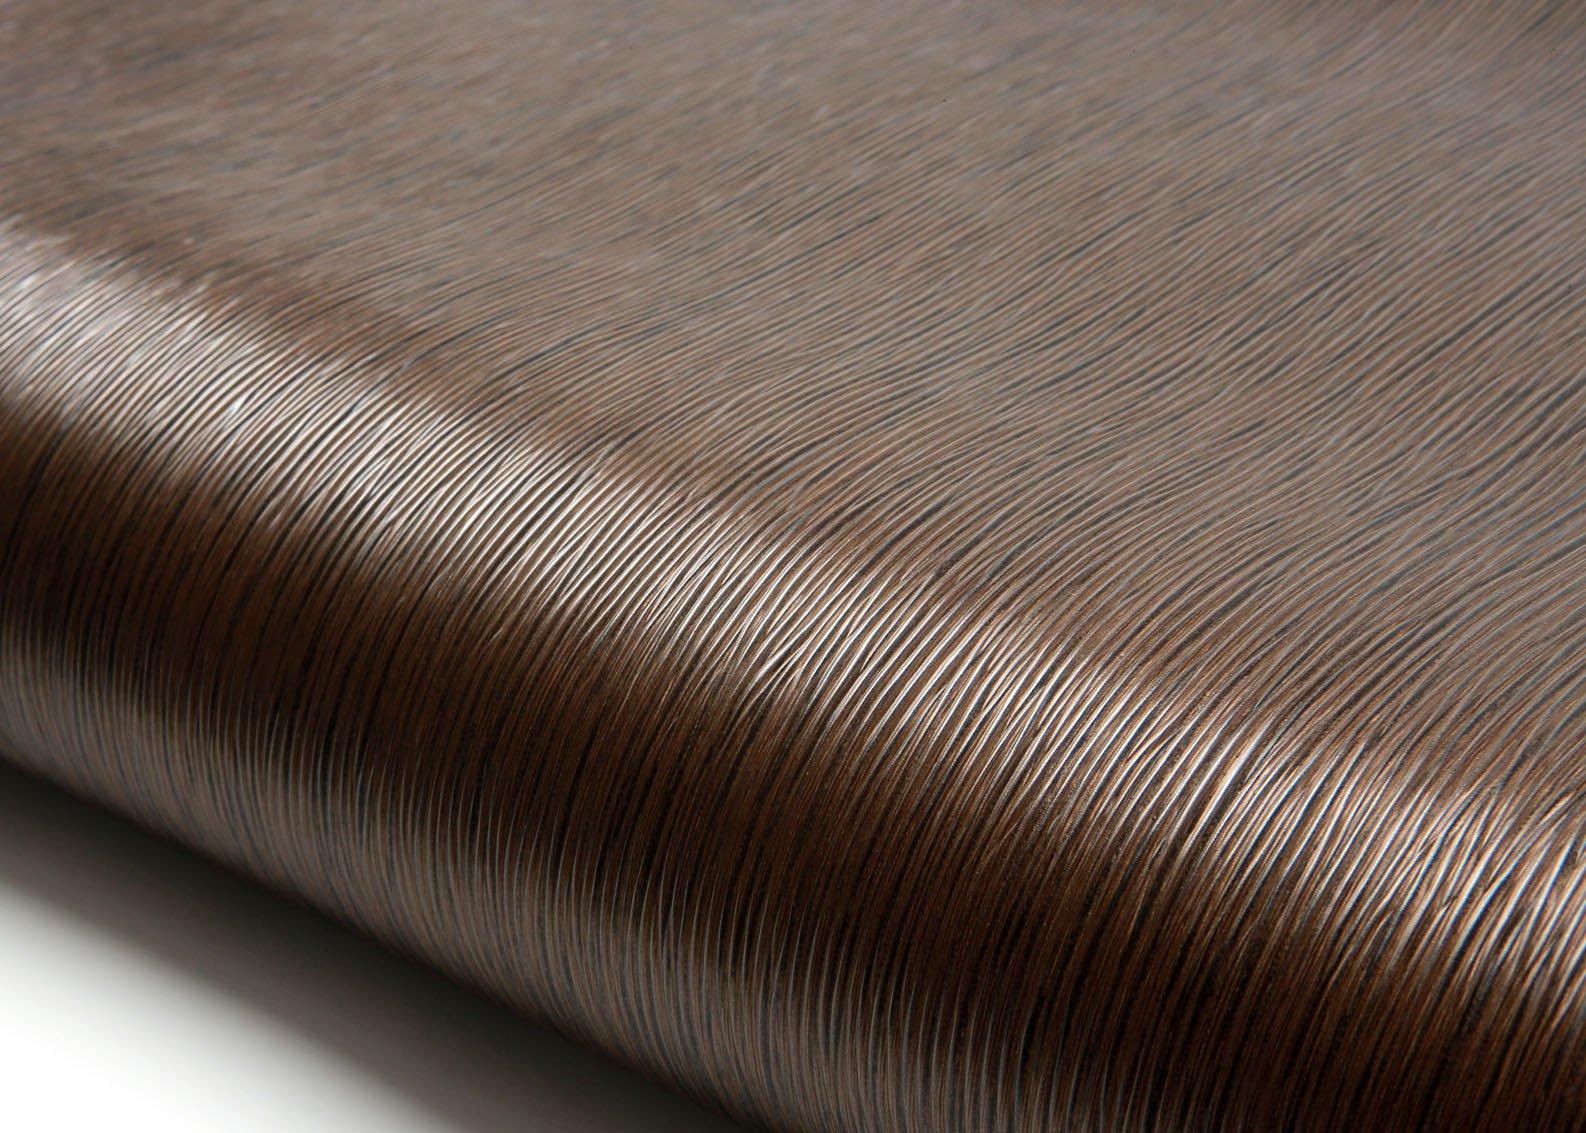 ROSEROSA Peel & Stick Backsplash Luxury Embossed Wood Contact Paper Self-adhesive Wallpaper Shelf Liner Table Door Reform (MG5008-6 : 2.00 Feet X 6.56 Feet)